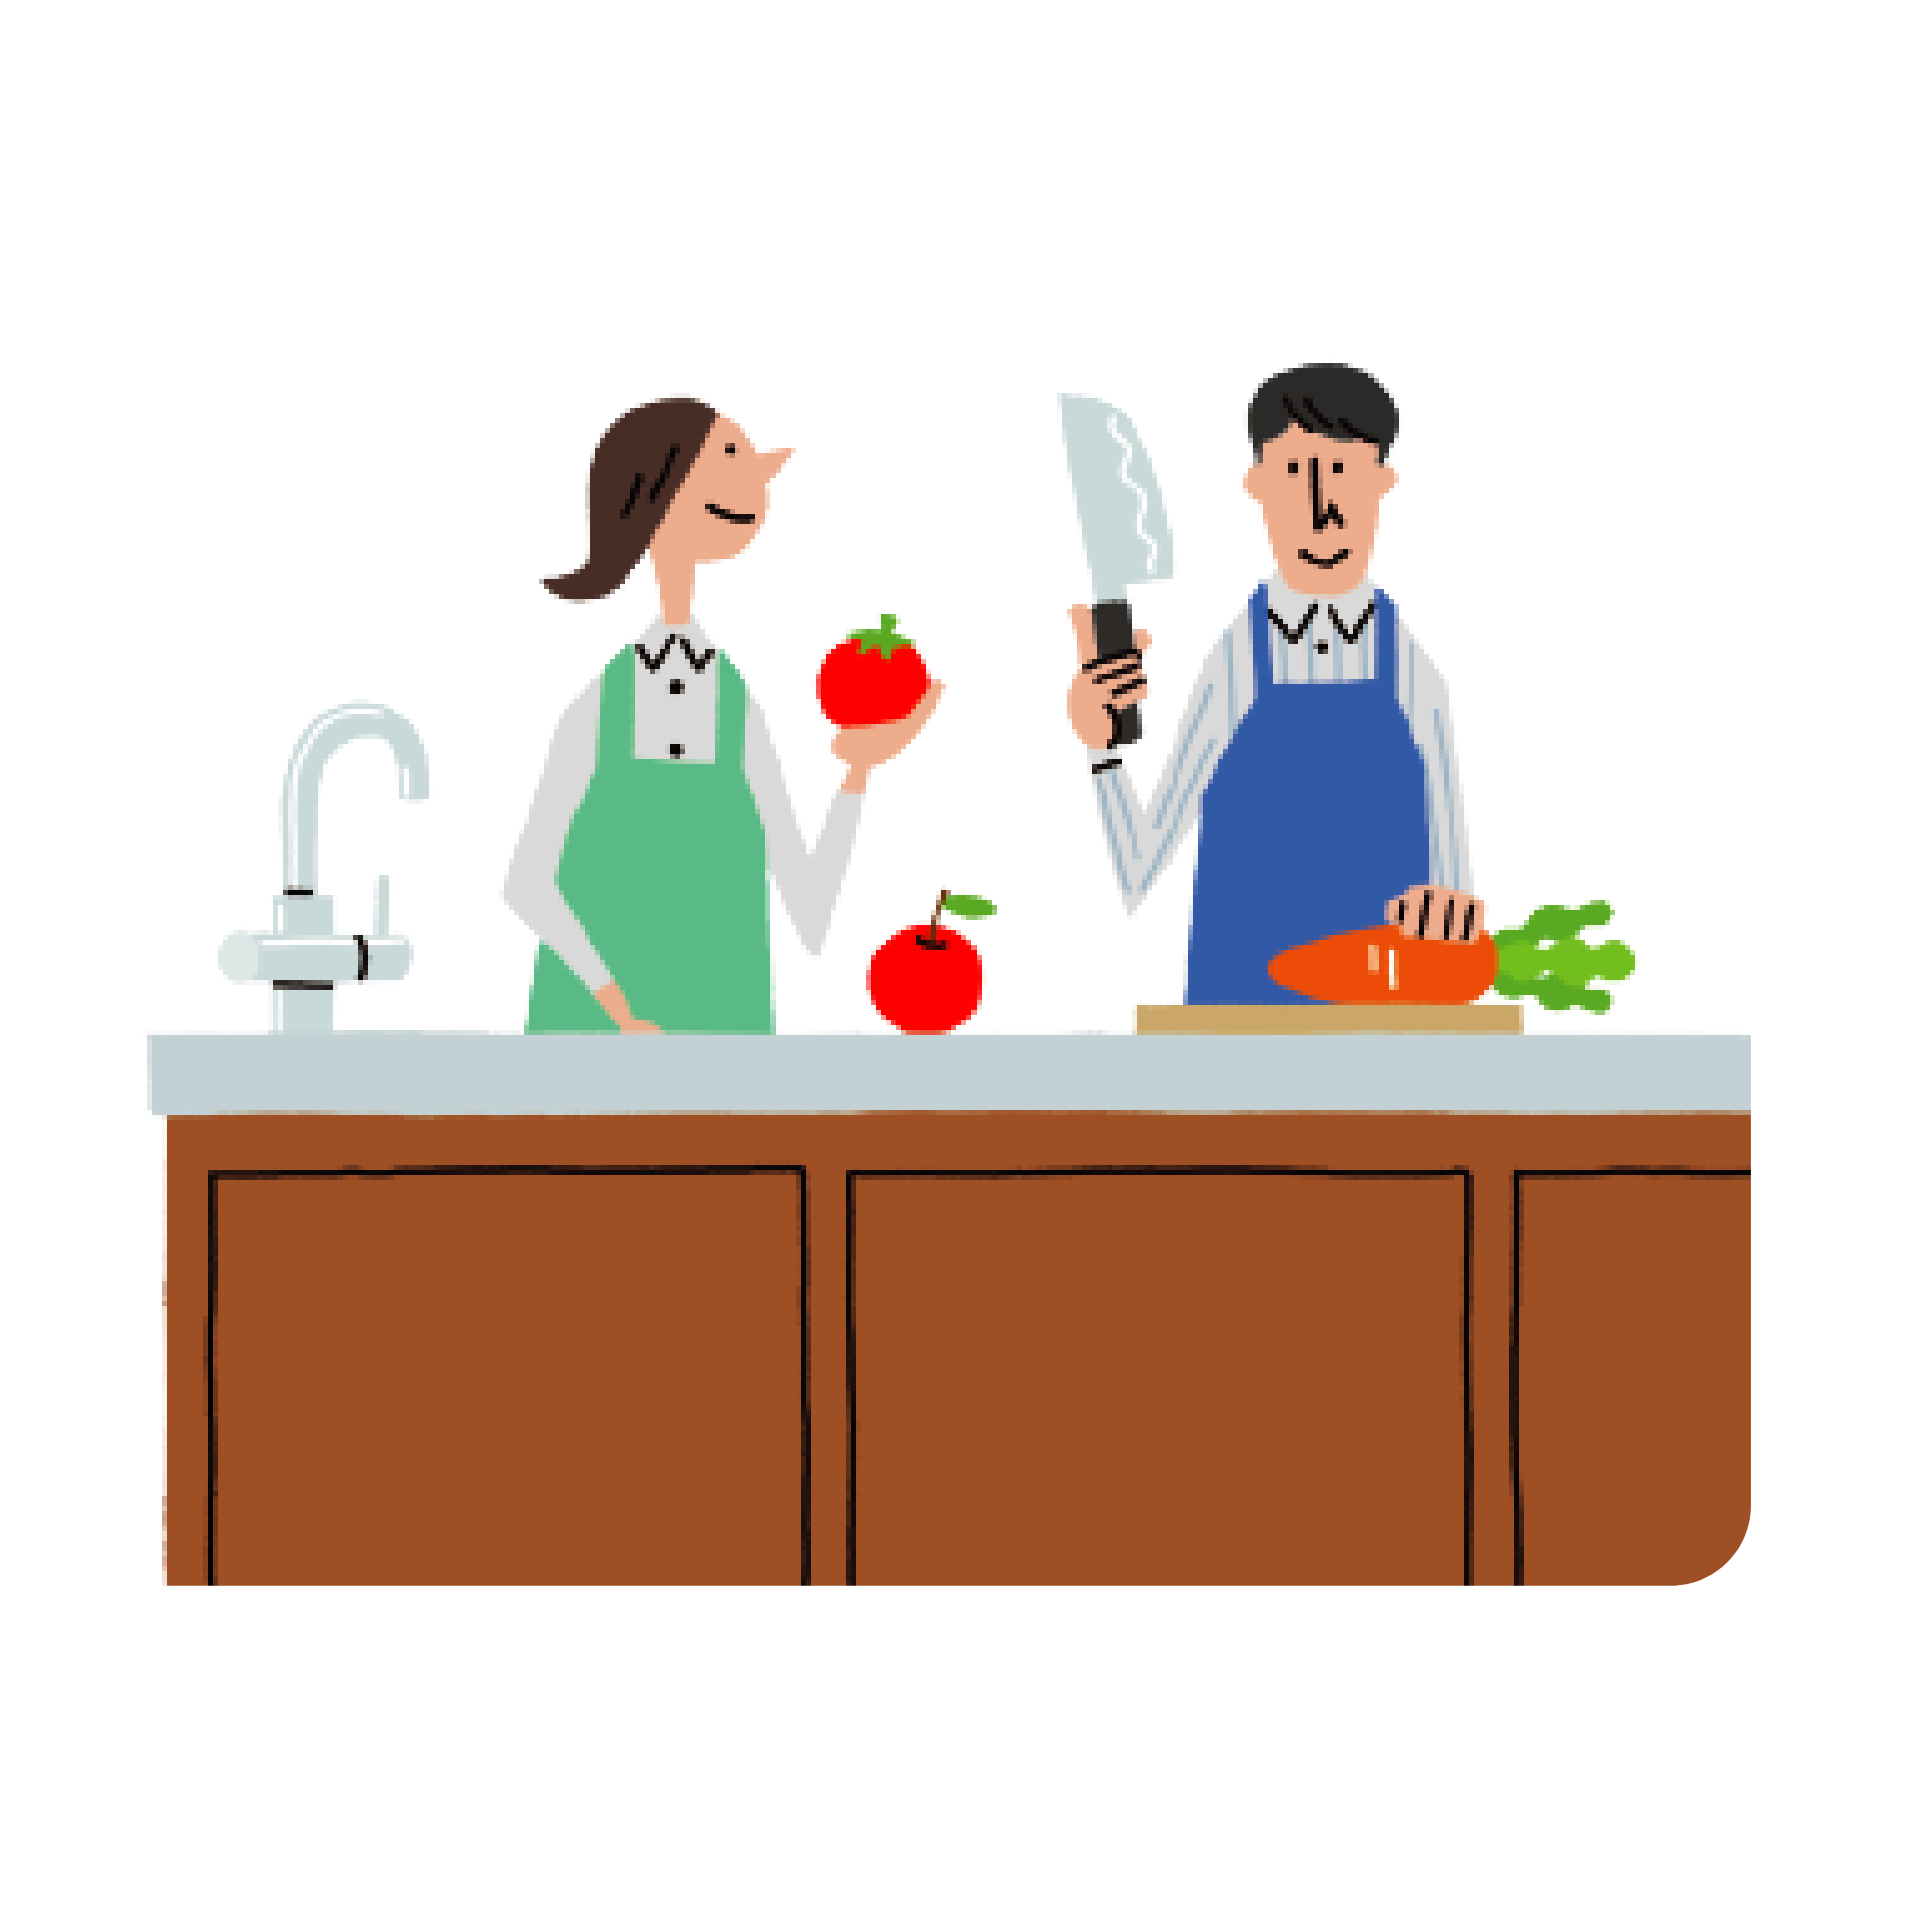 健康野菜の料理教室 10月22日(金)